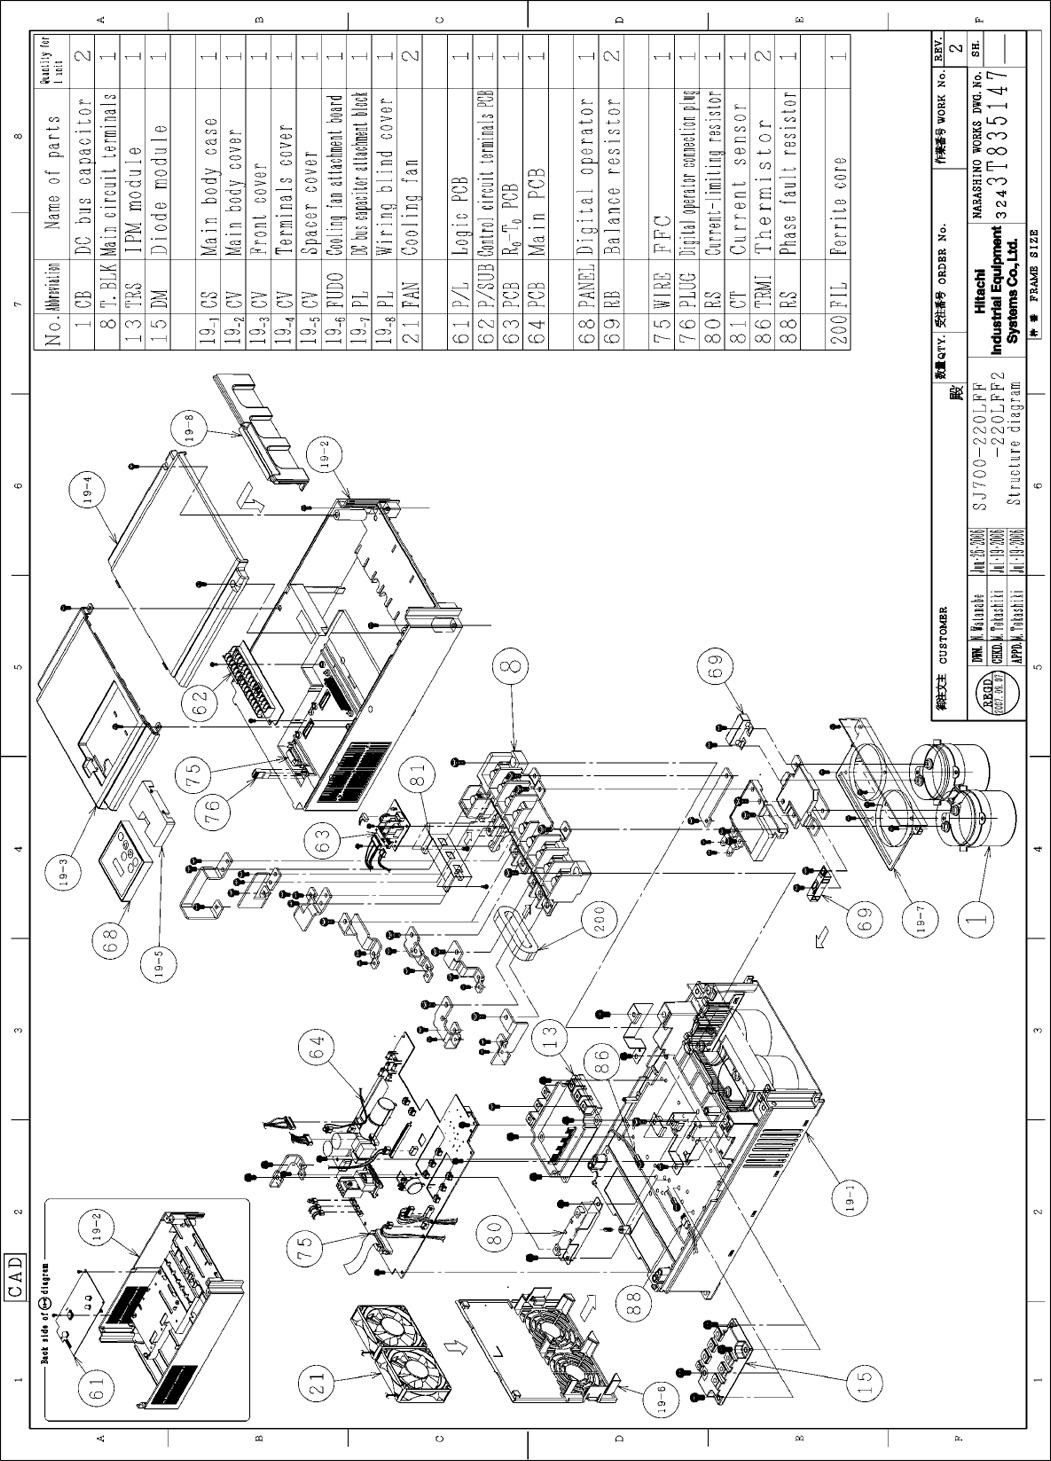 2004 audi a8 engine diagram html